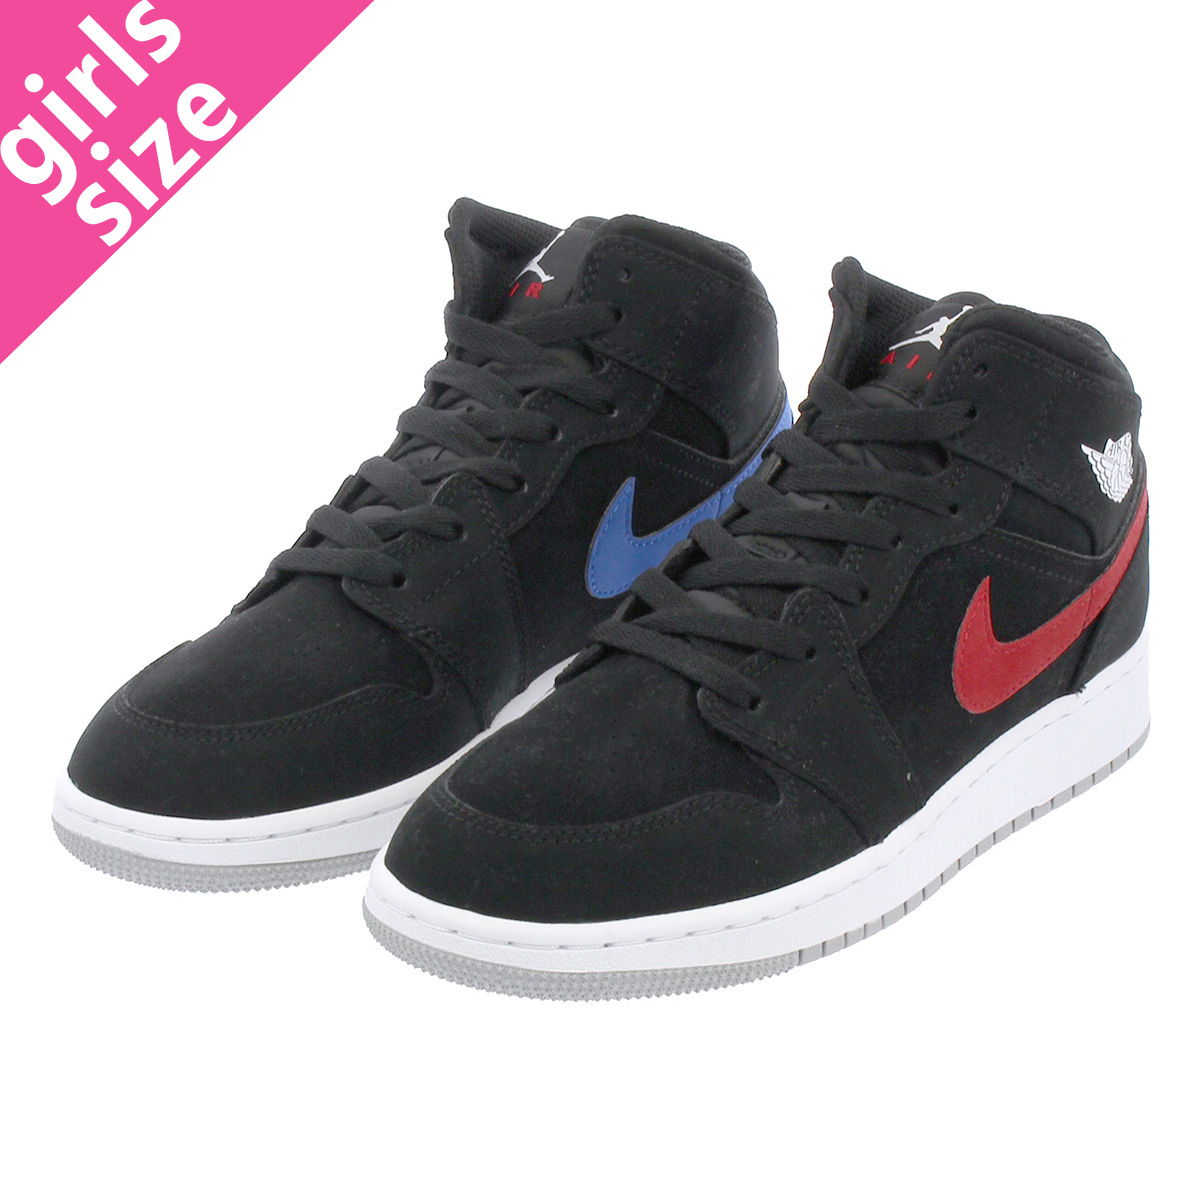 detailed look bf8a7 6721b NIKE AIR JORDAN 1 MID BG Nike Air Jordan 1 mid BG BLACK WHITE  ...